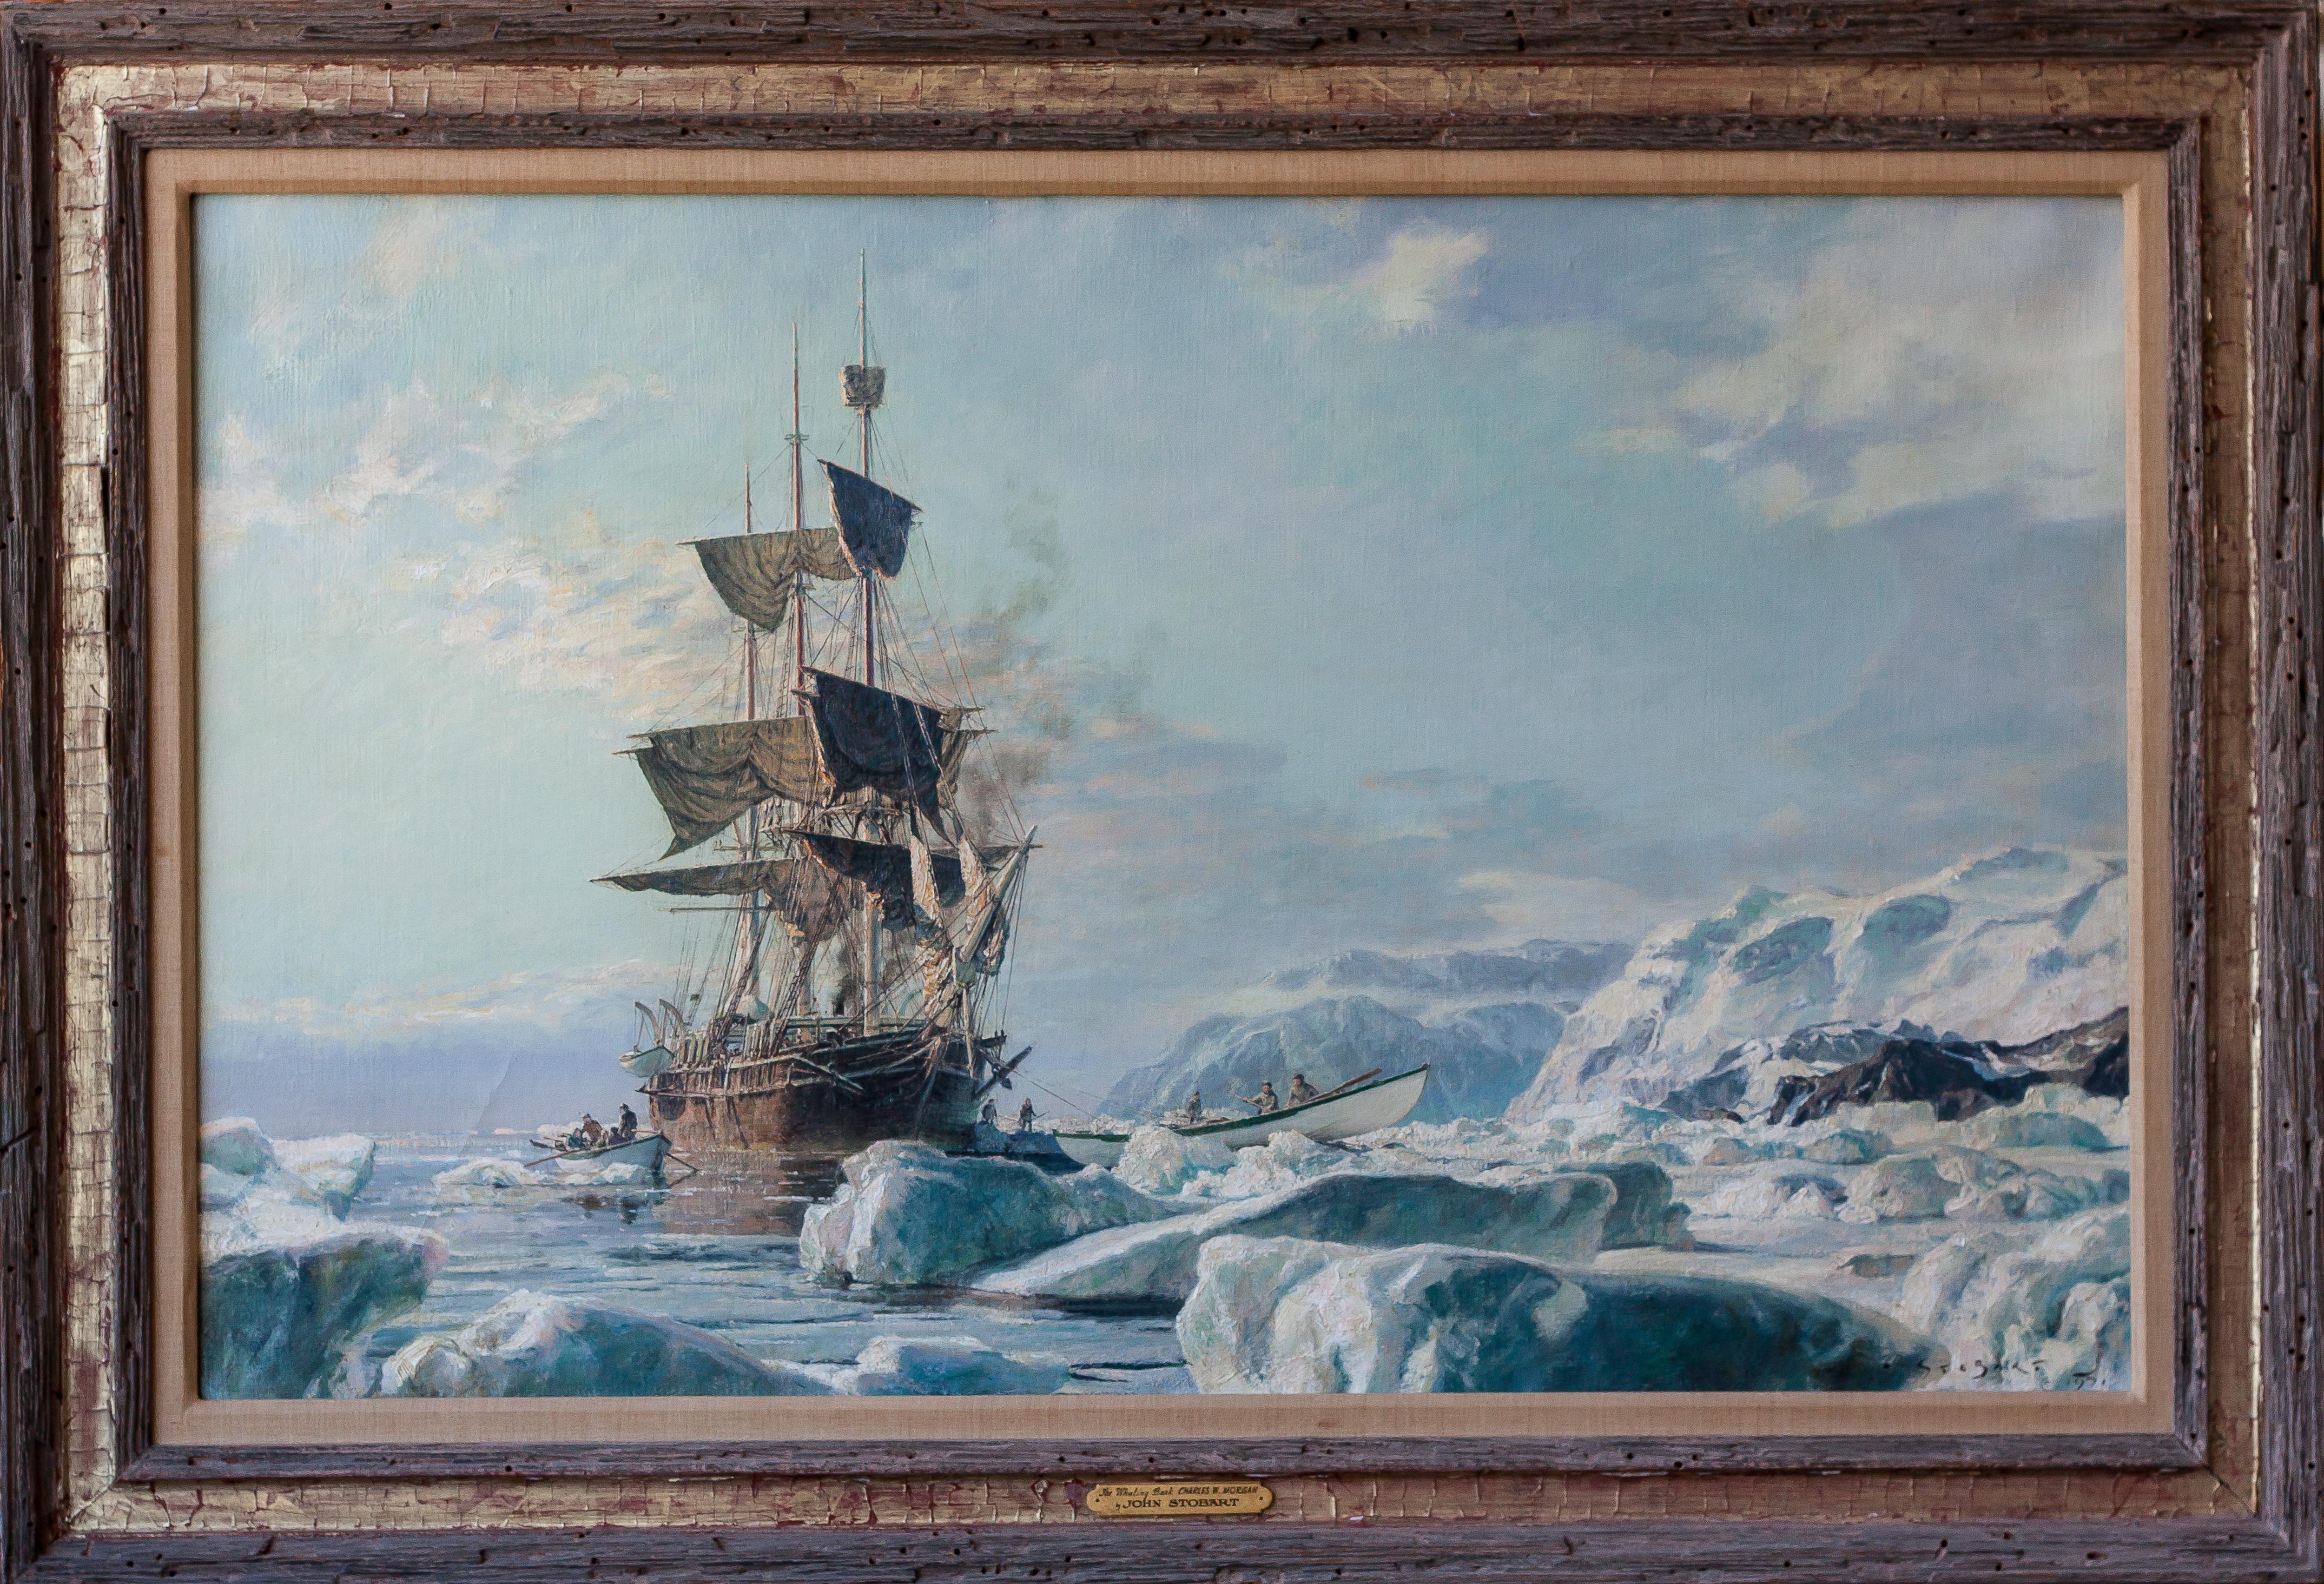 Whaling Bark, Charles W. Morgan HR